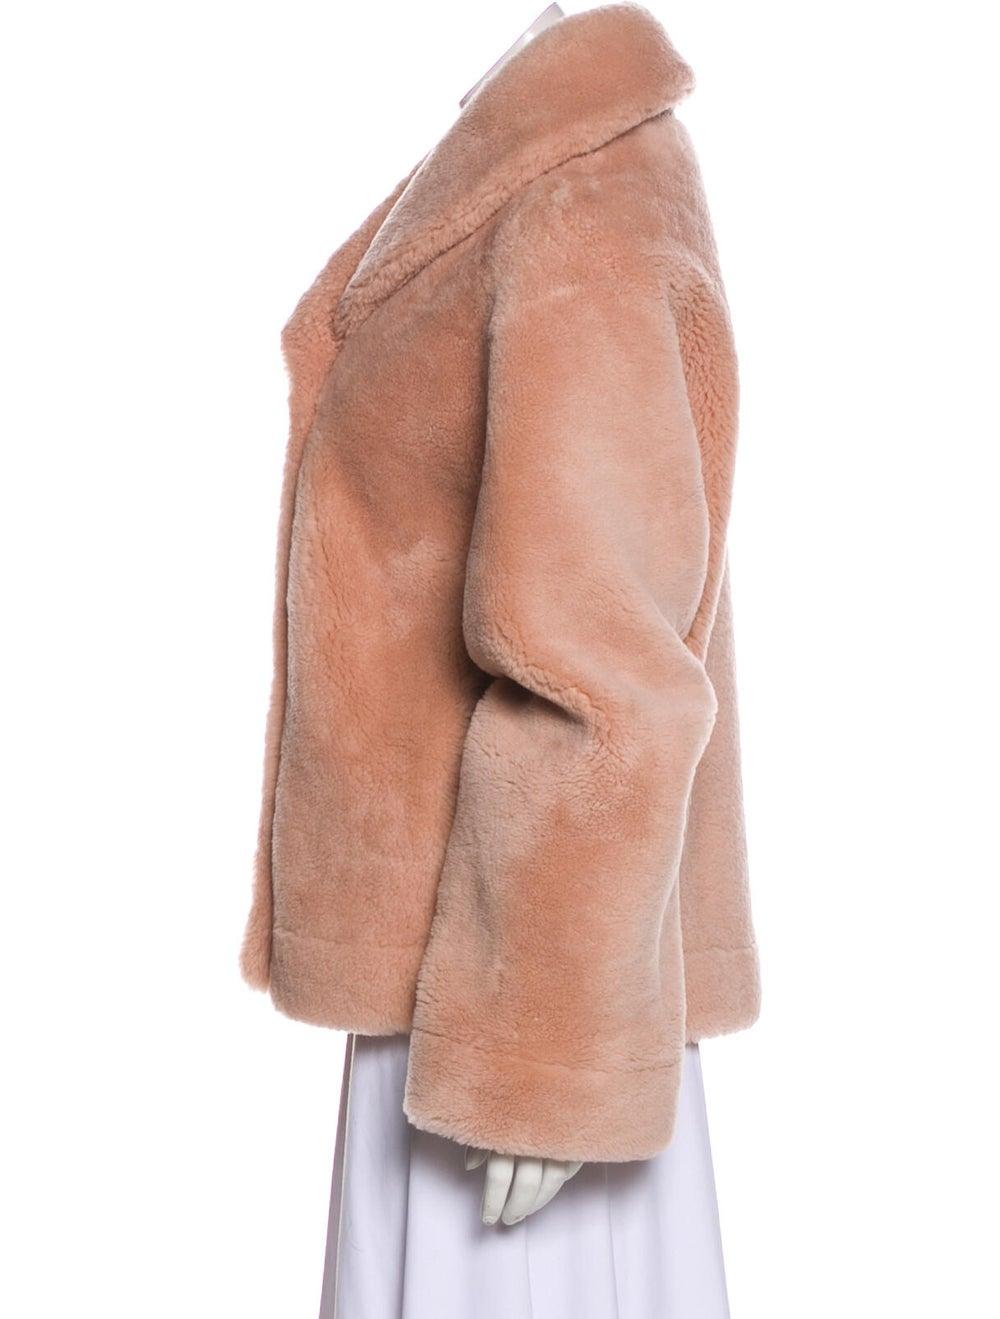 Balmain Shearling Button-Up Jacket Pink - image 2